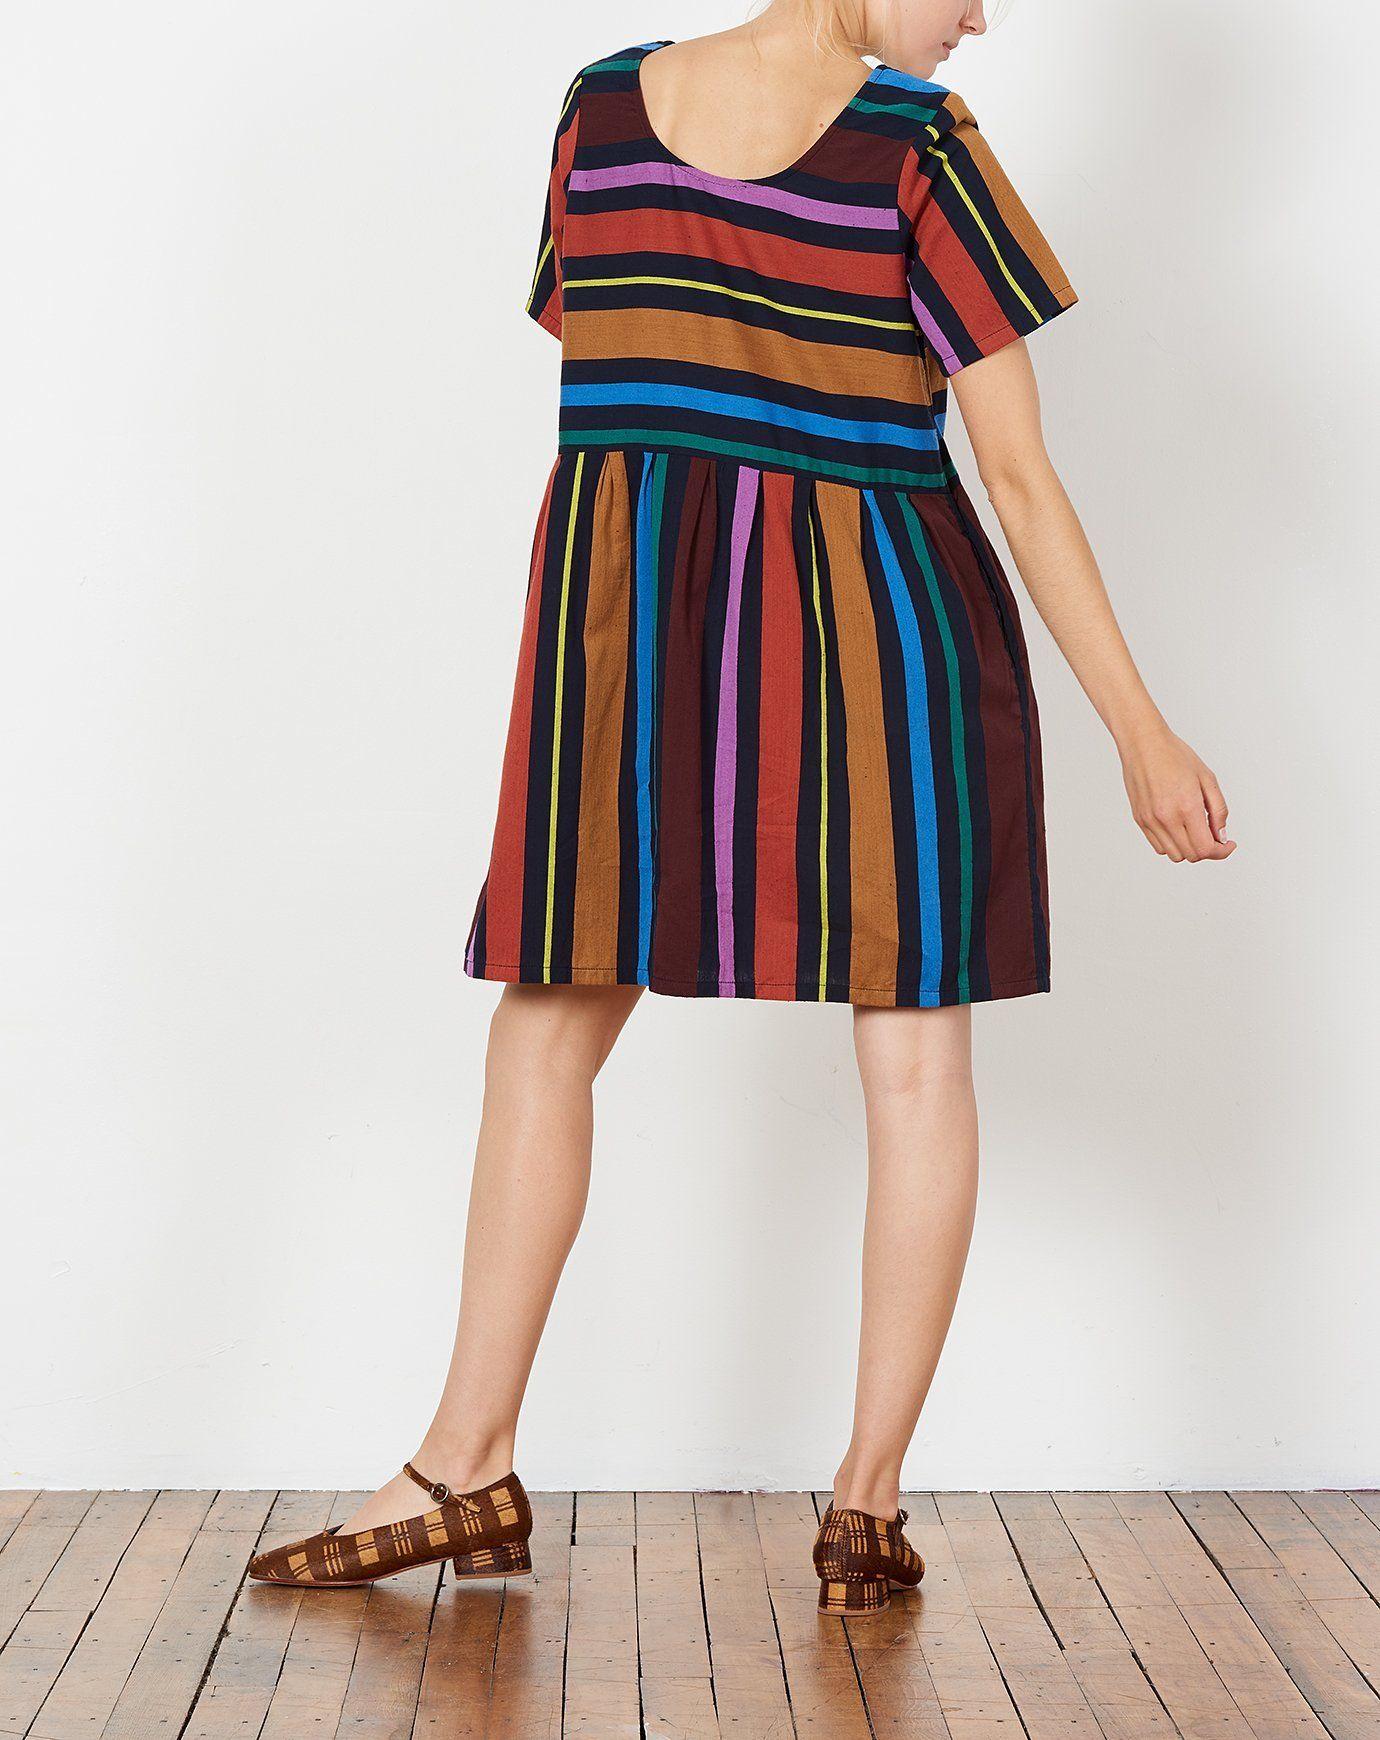 Ace   Jig Misty Dress in Ribbon Candy  91e474f32